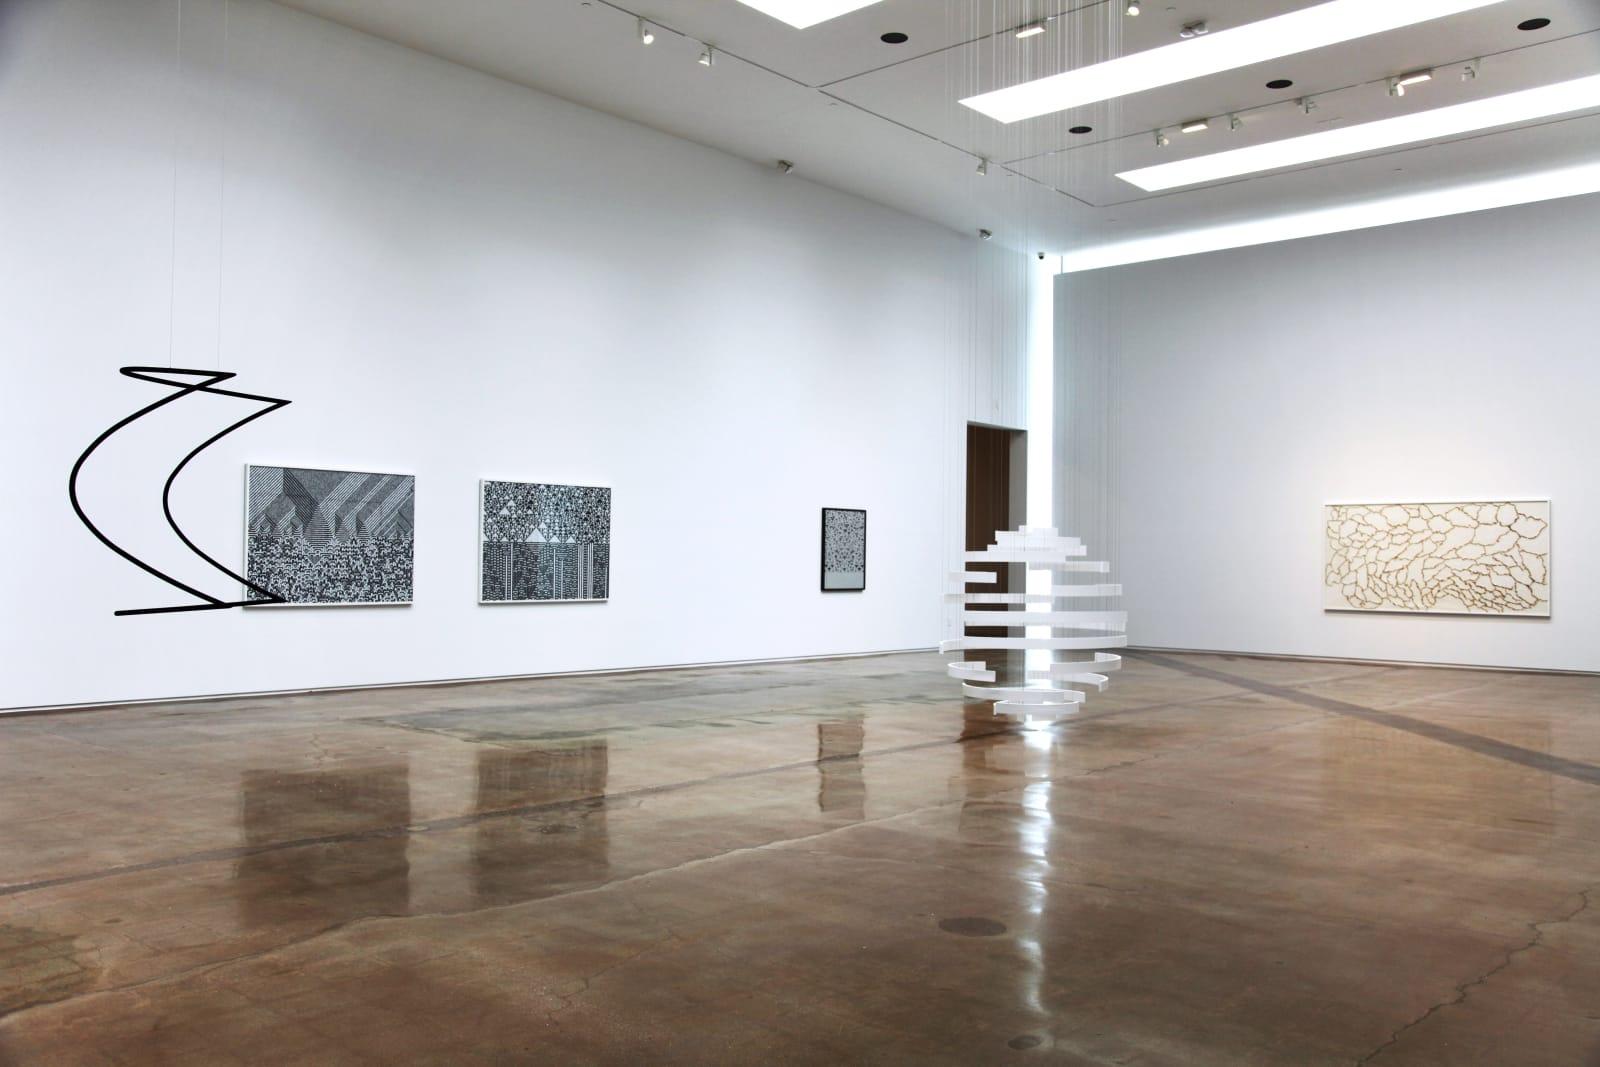 Installation View, Cartography of Control, Kohn Gallery, Los Angeles (2015) | Photo: Studio Troika